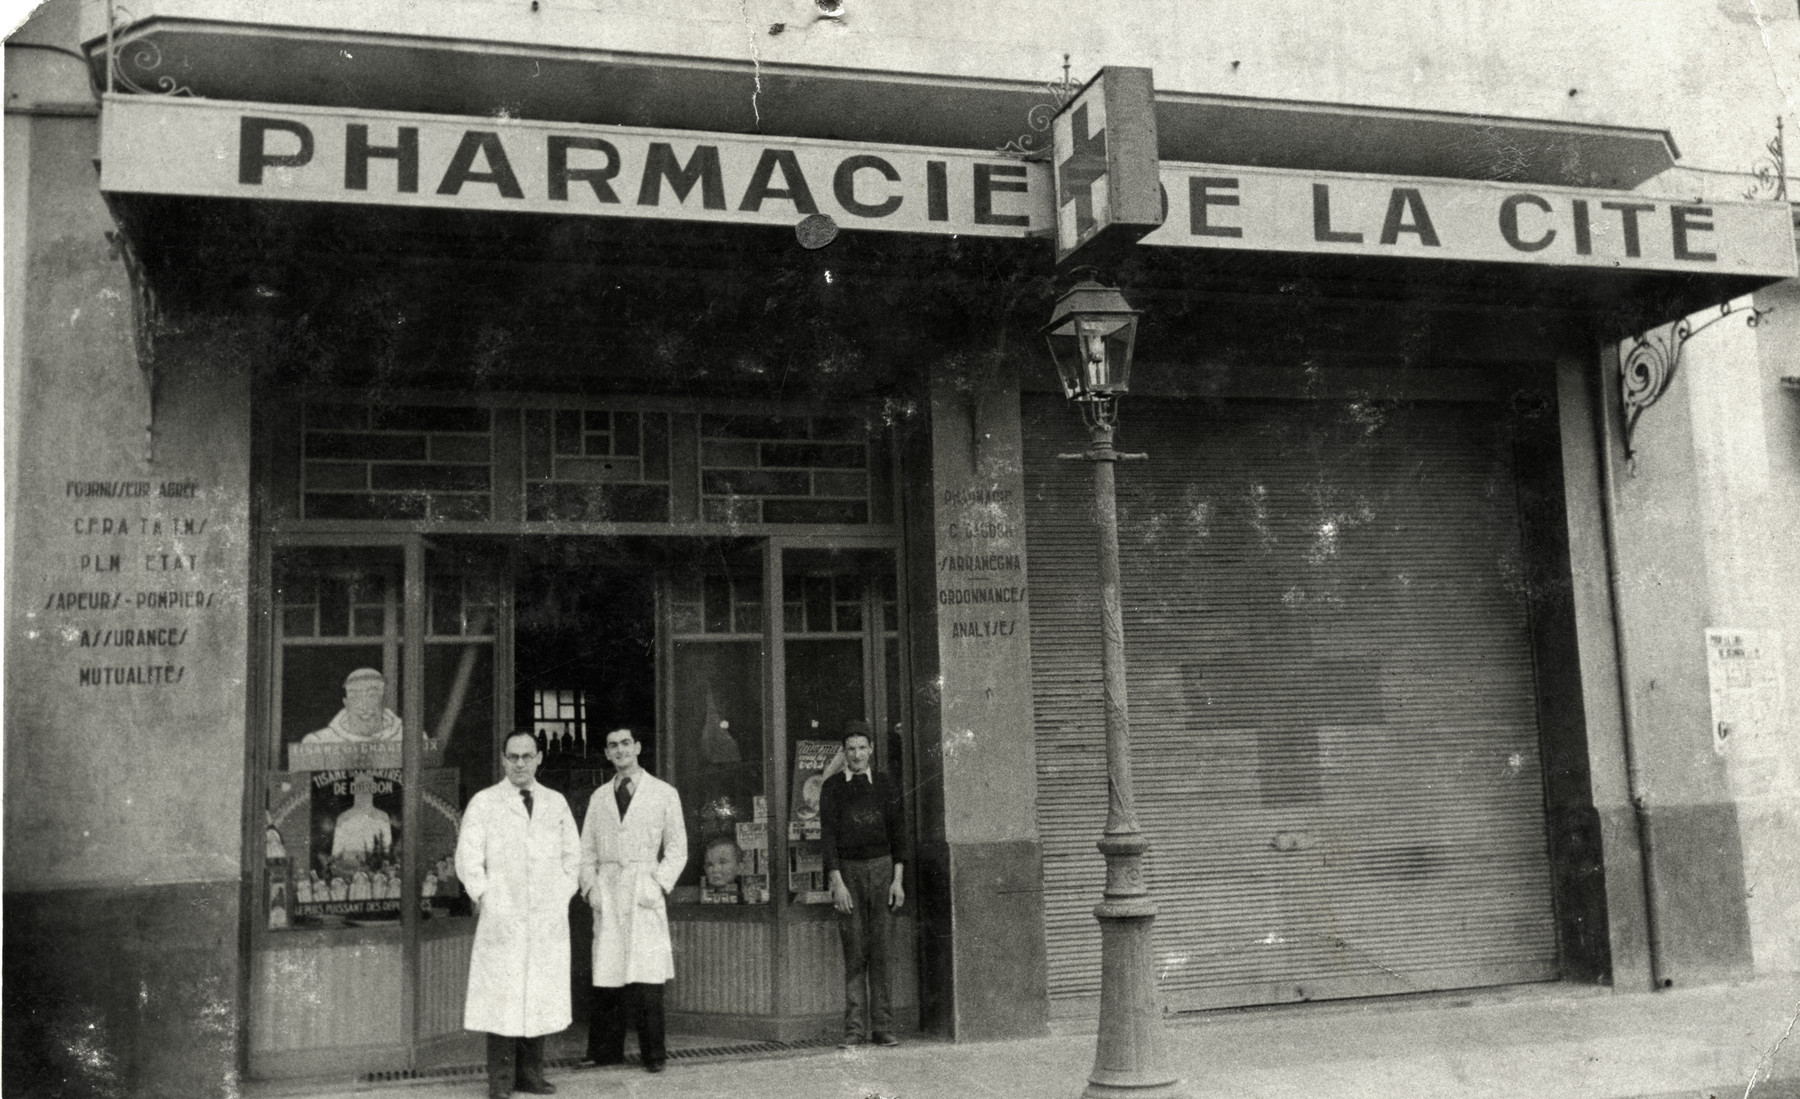 Josef Roger Cheraki stands in front of his pharmacy in Algiers.